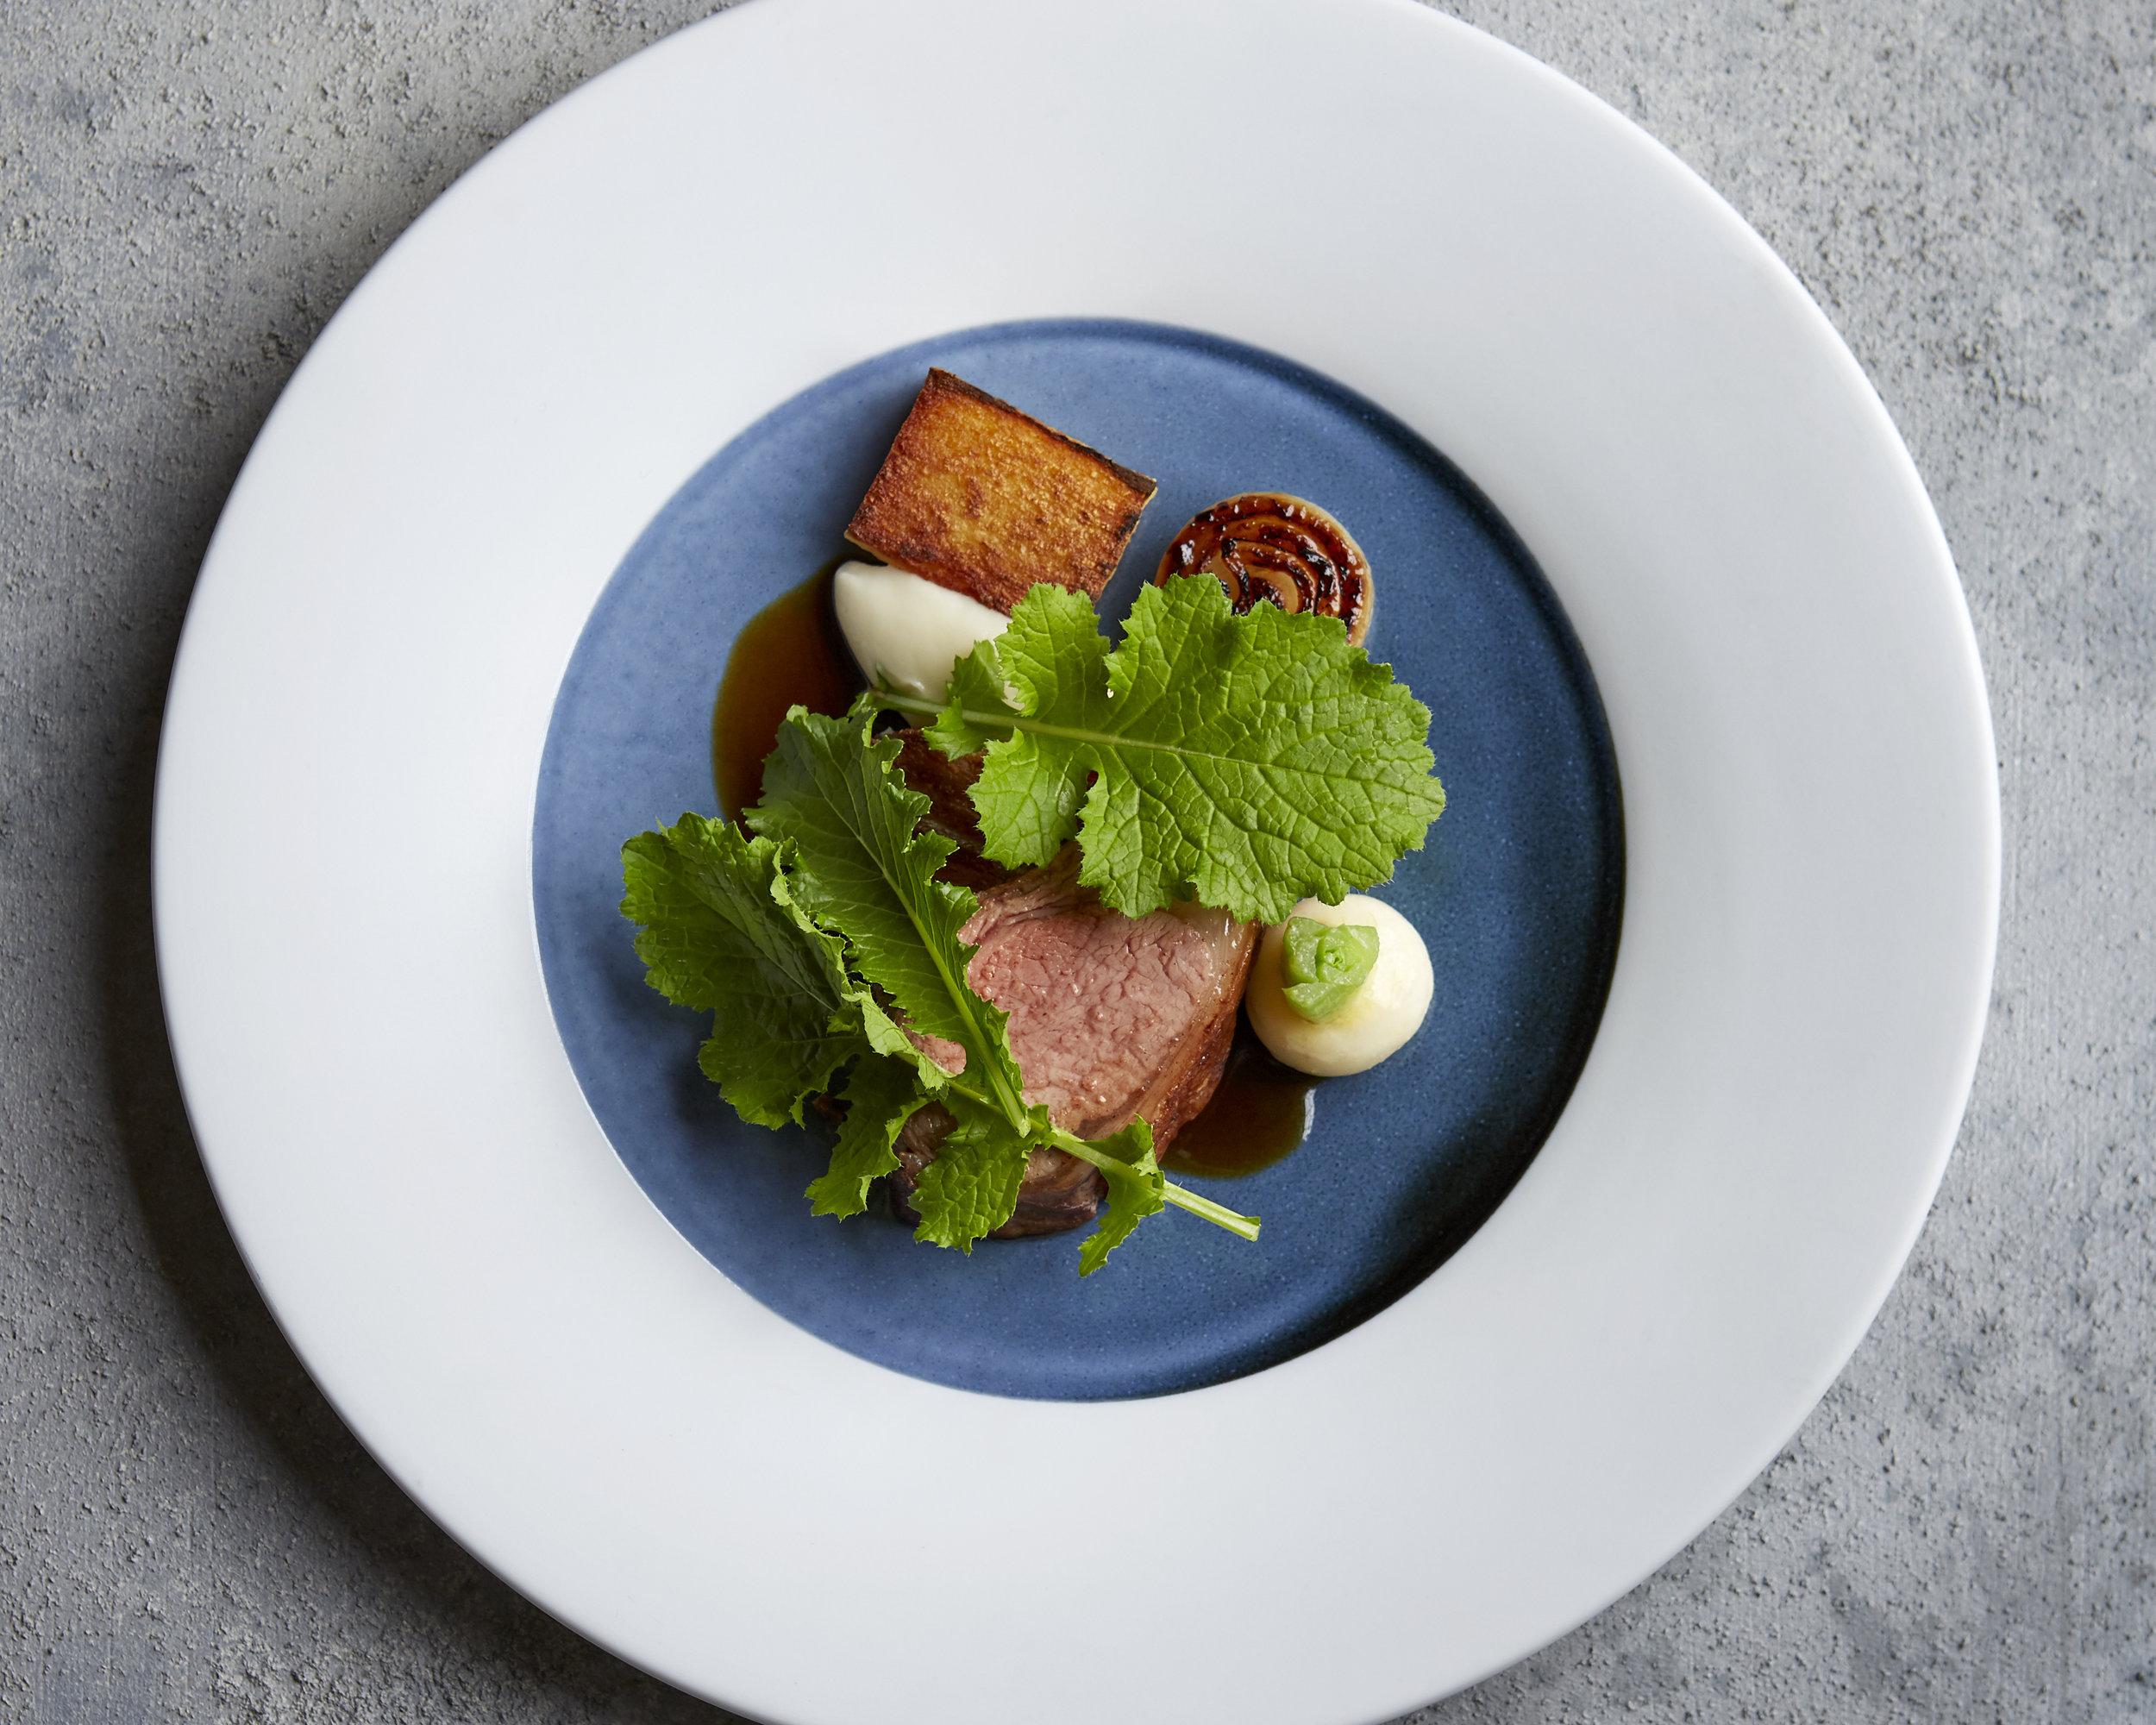 20181120_Pensons_Restaurant_05_Lamb_Turnips_Onion_008_Patricia_Niven.jpg